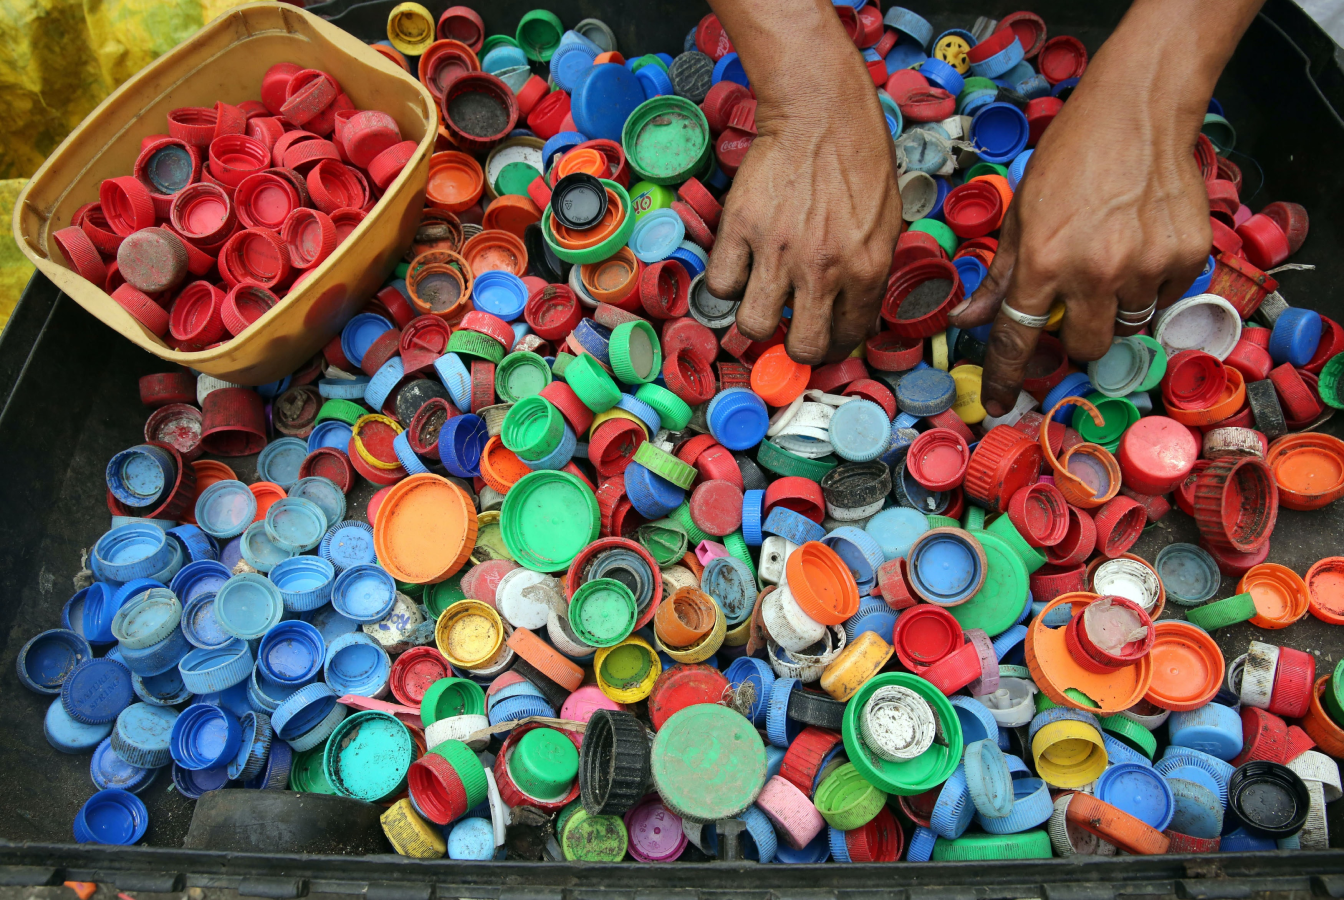 Pair of hands sorting plastic bottle caps